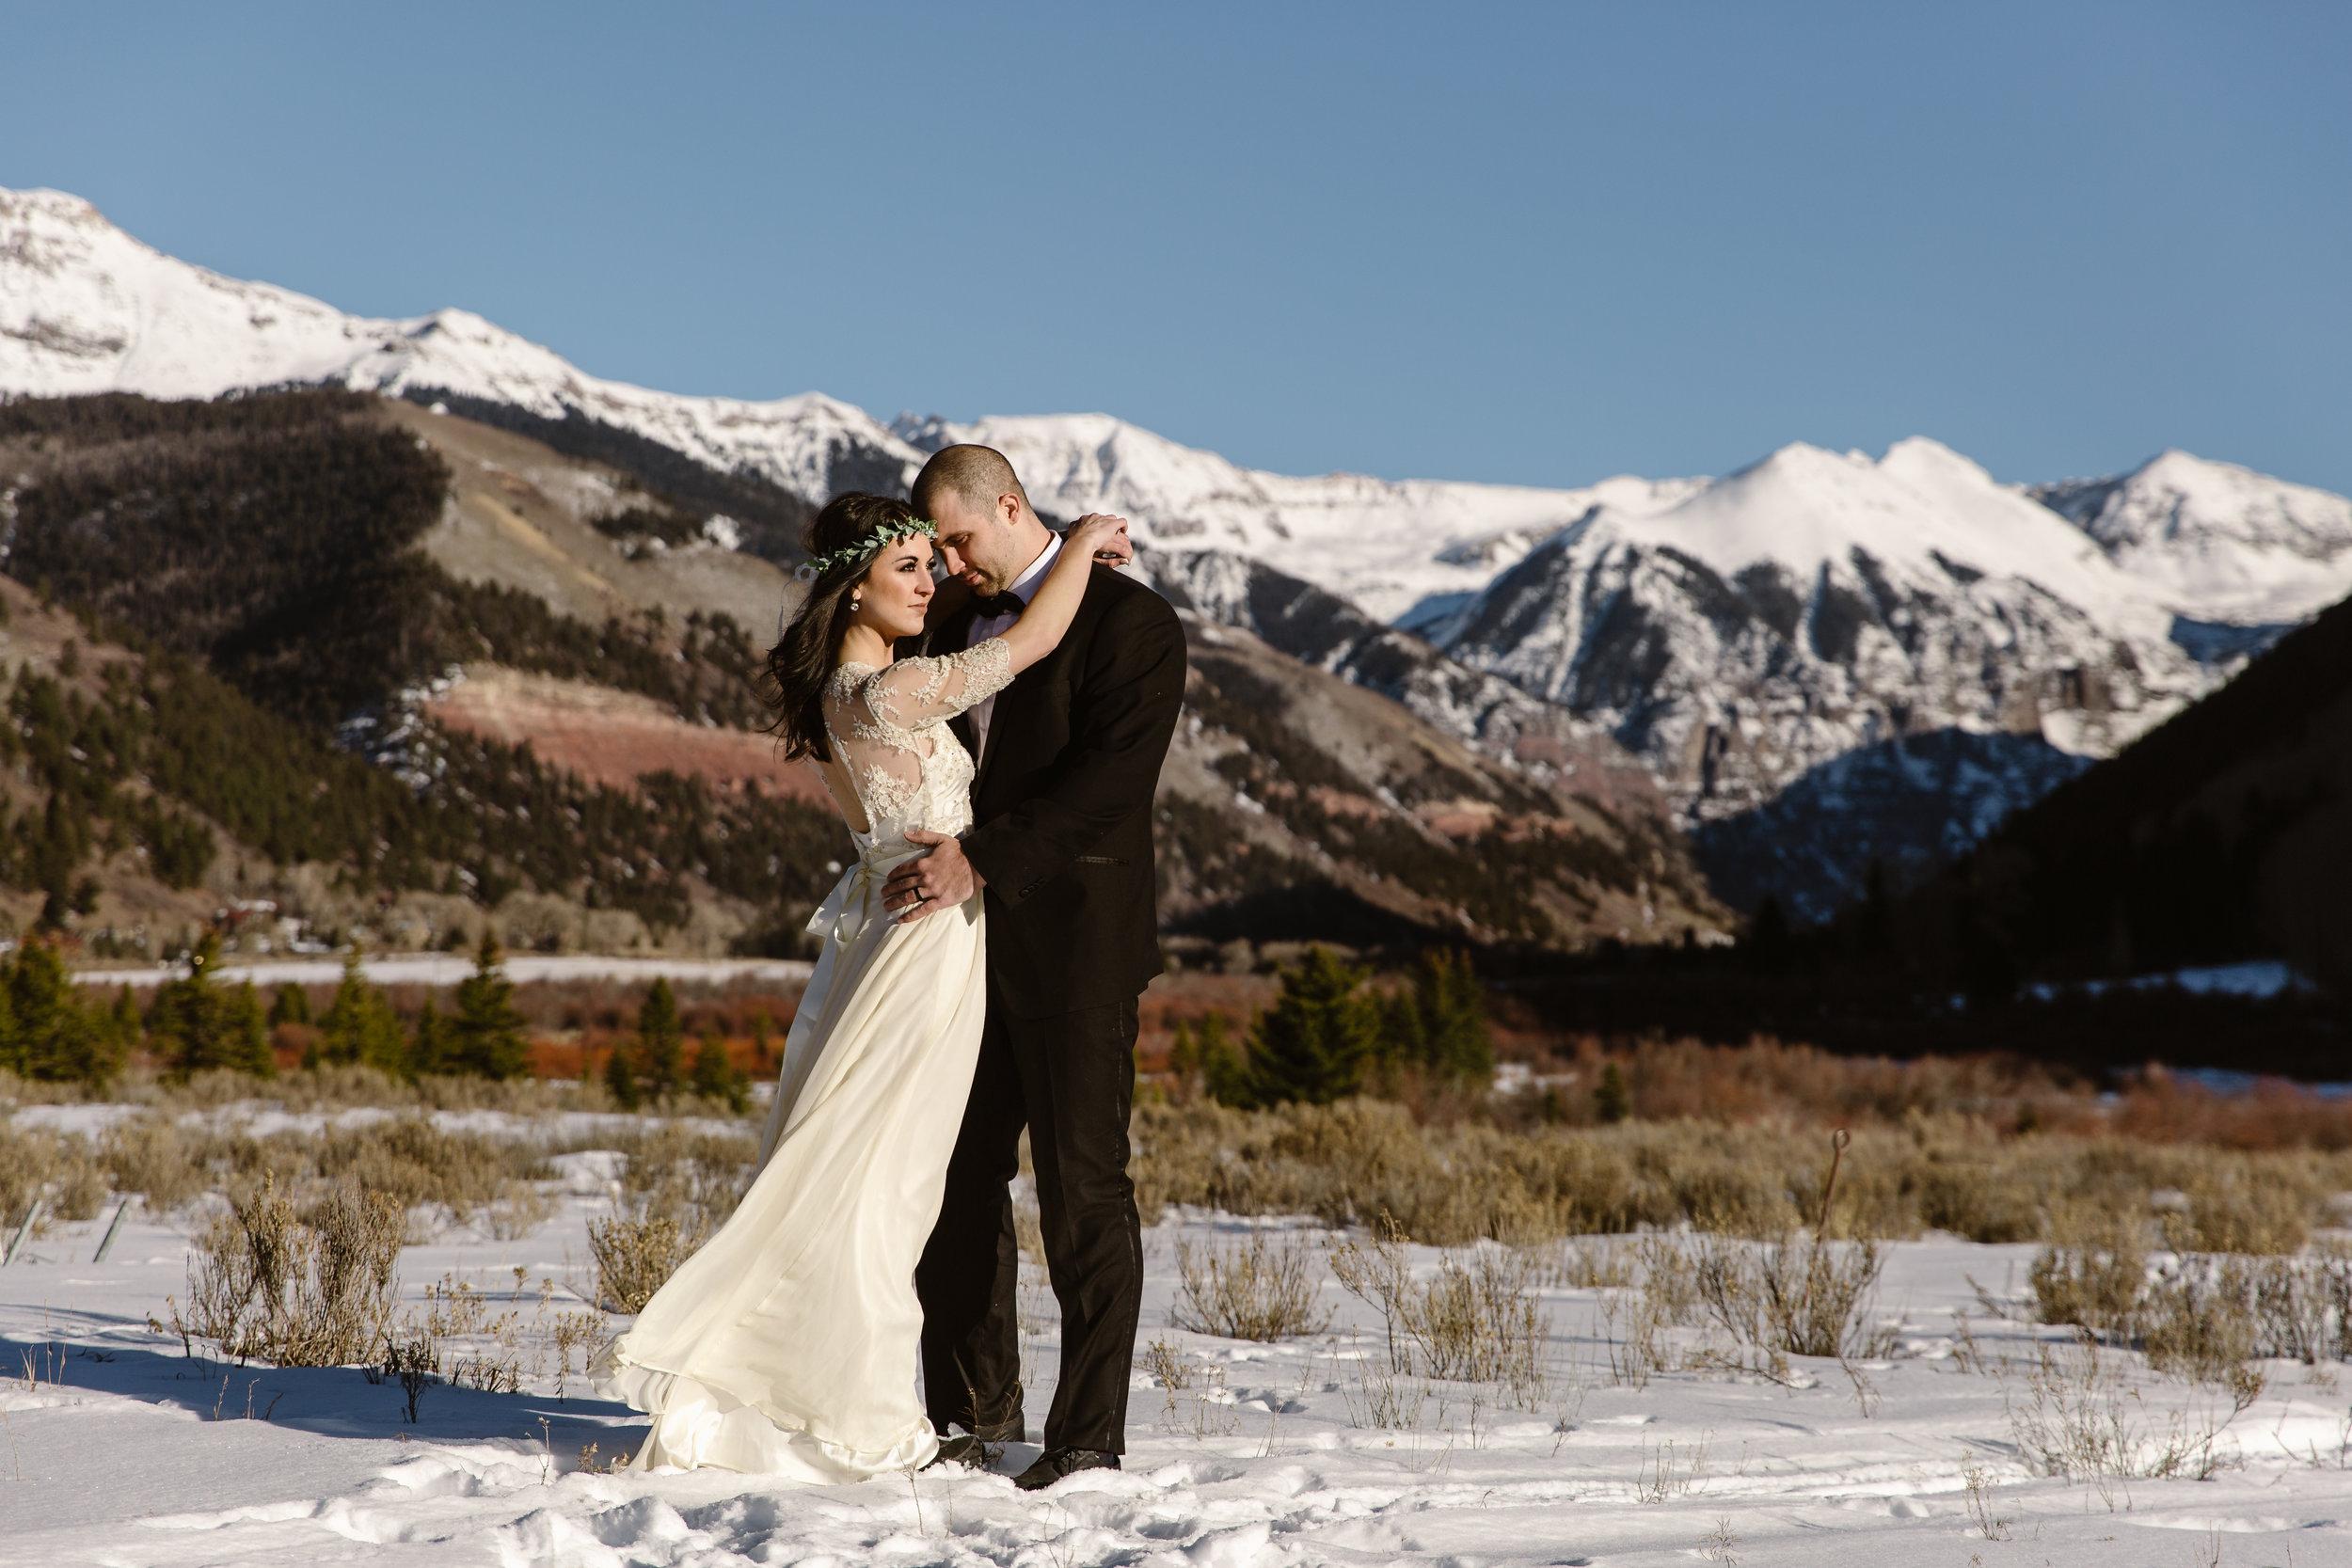 LD-Telluride-Wedding-Mountain-LeahandAshton-Photography-71.jpg